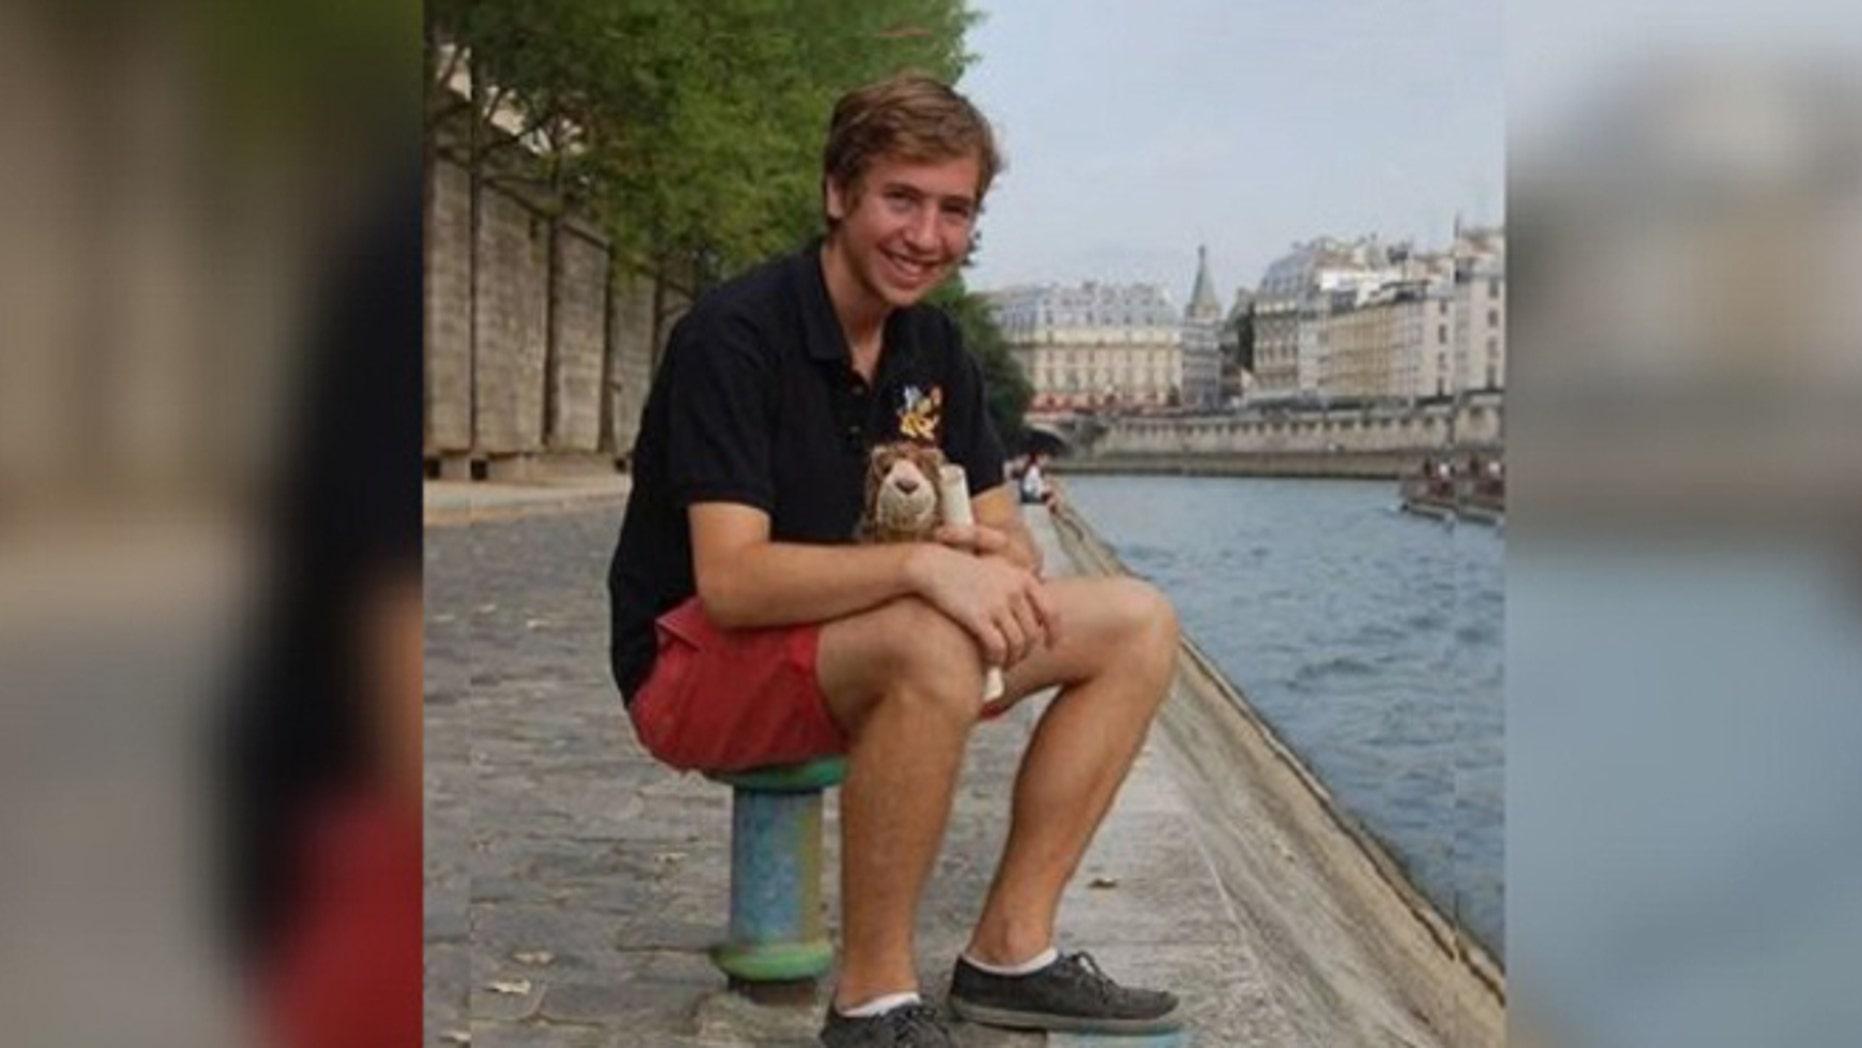 Swarthmore College sophomore Sam Jenkins died after a skateboarding accident last week.